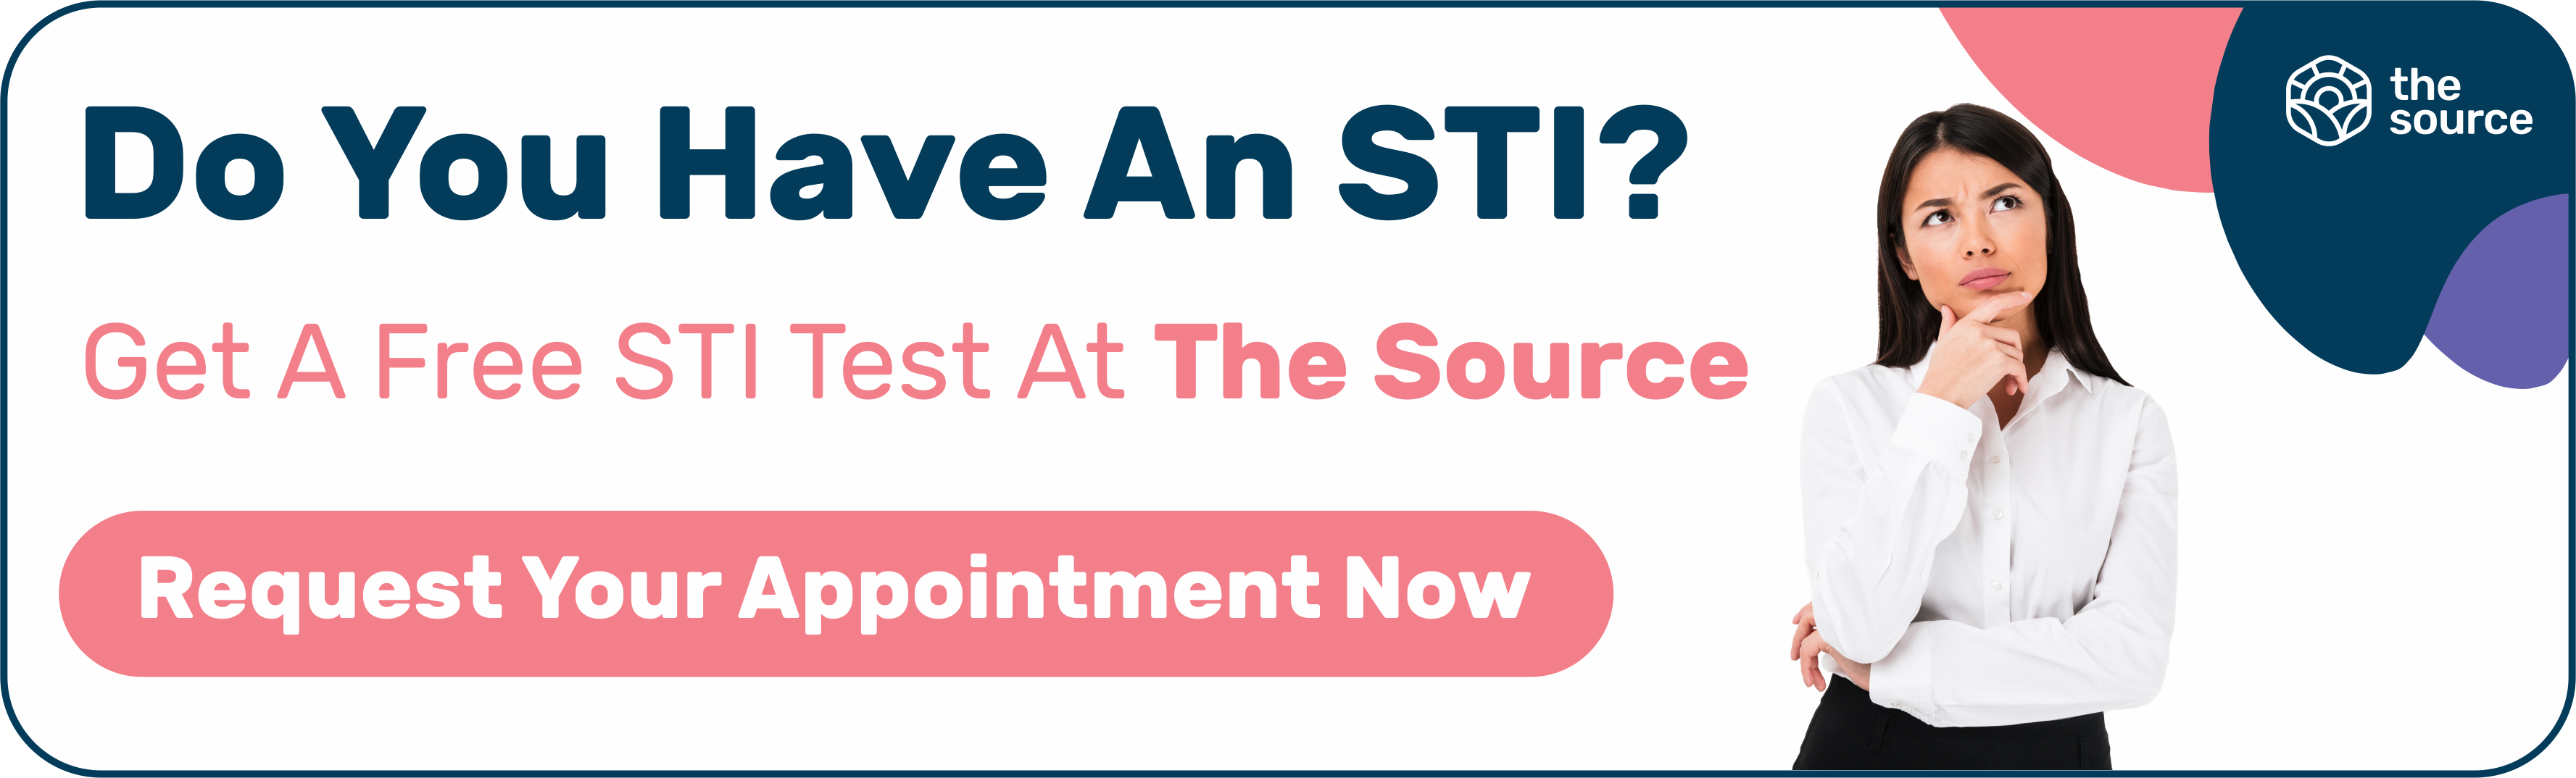 Free std test